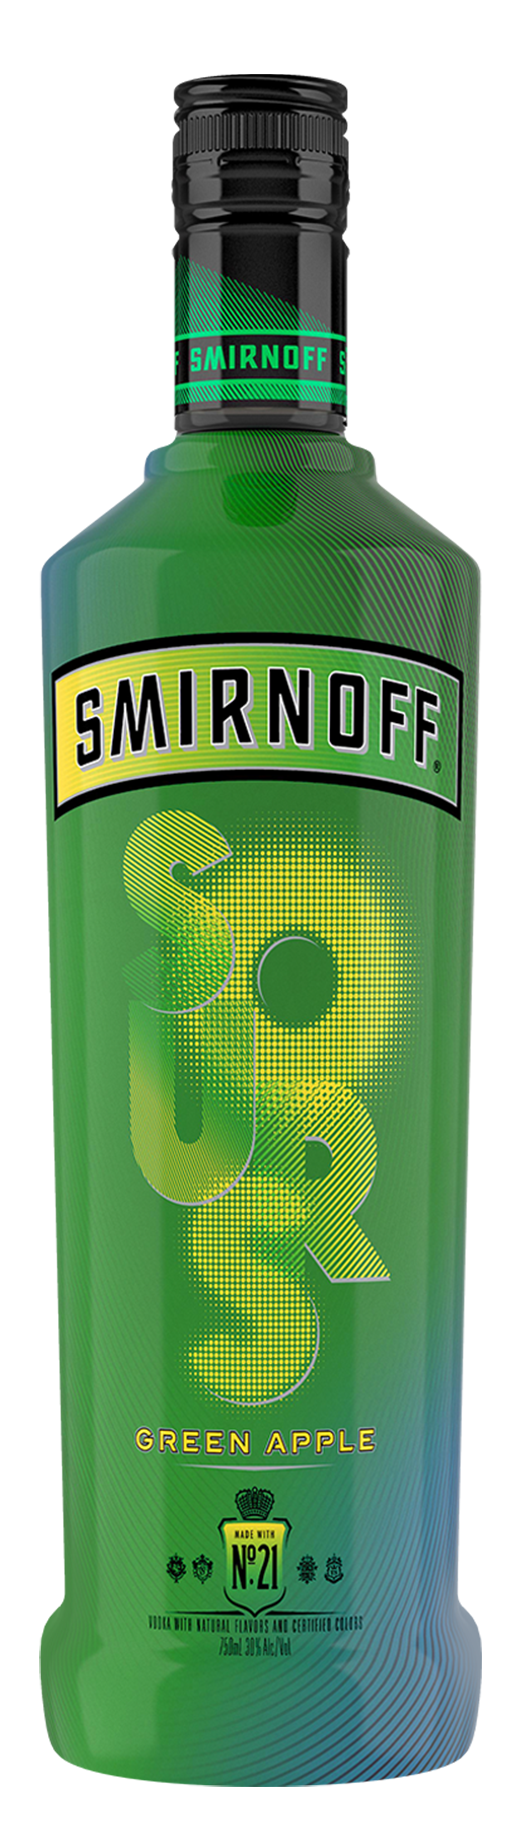 SMIRNOFF SOURS GREEN APPLE